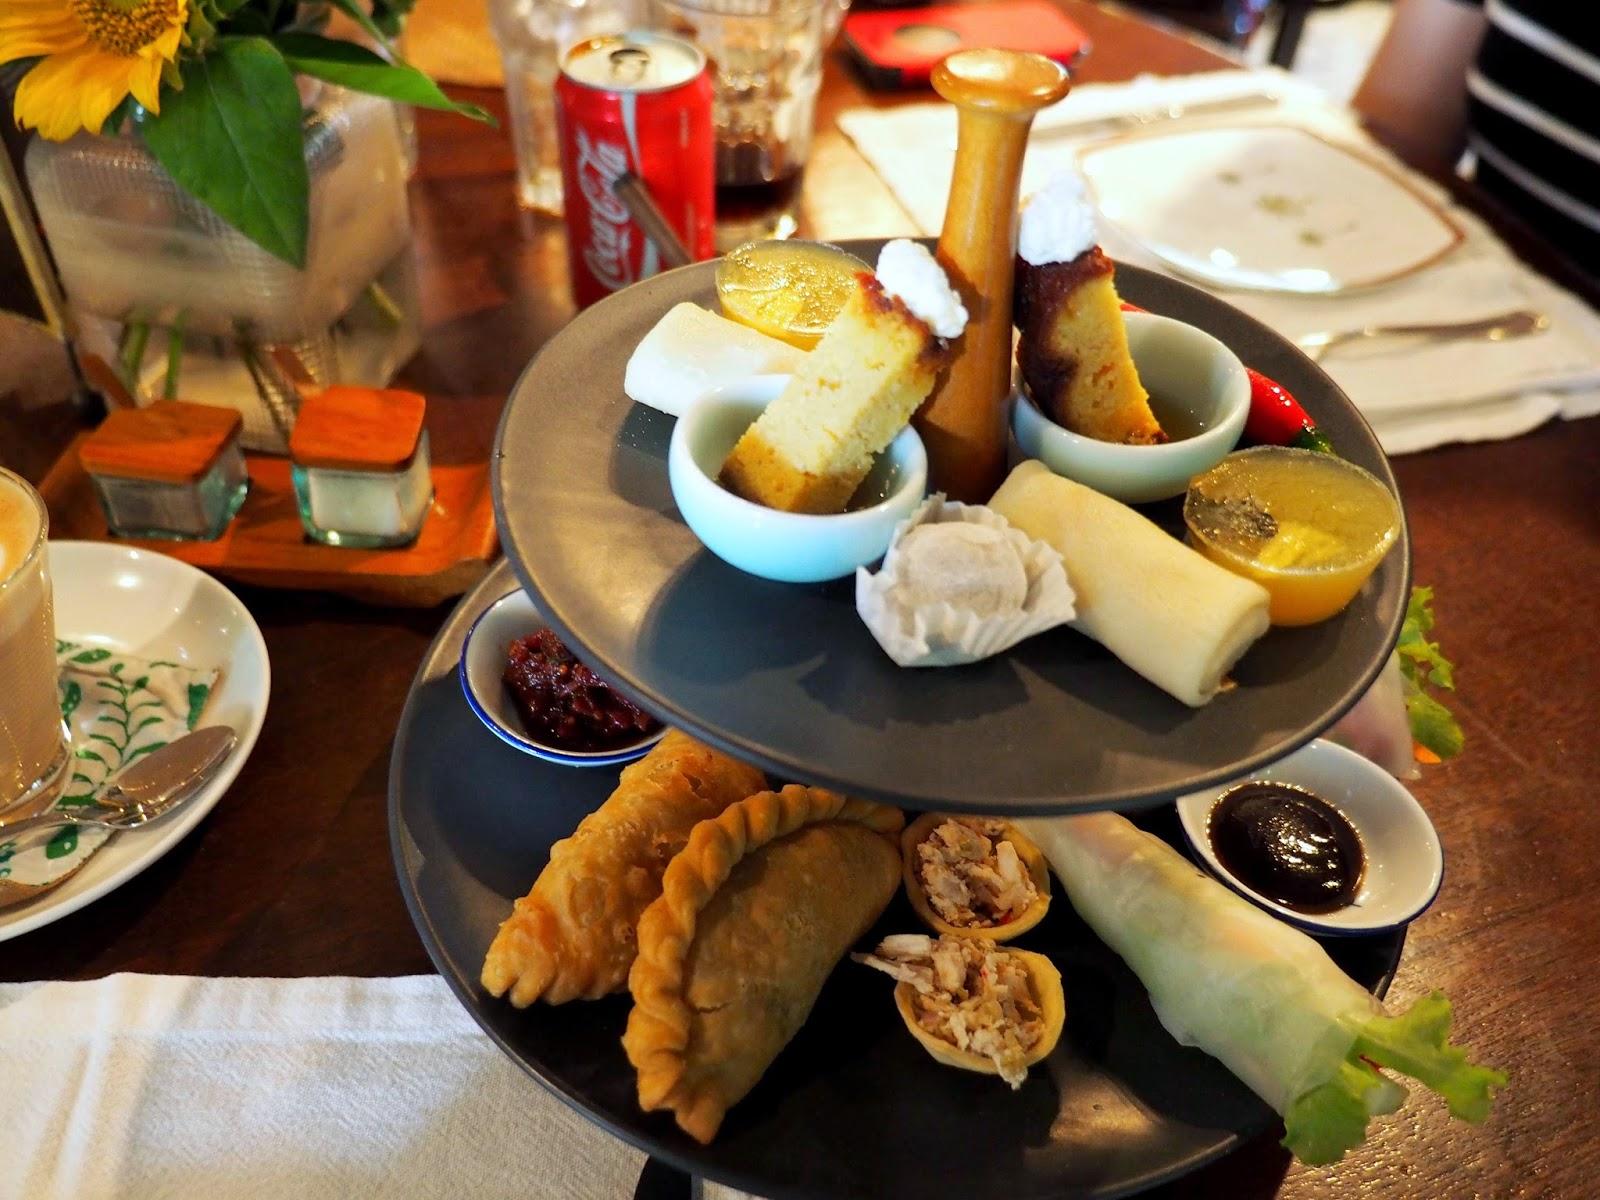 Bali 2014 biku restaurant for Club sandwich fillings for high tea